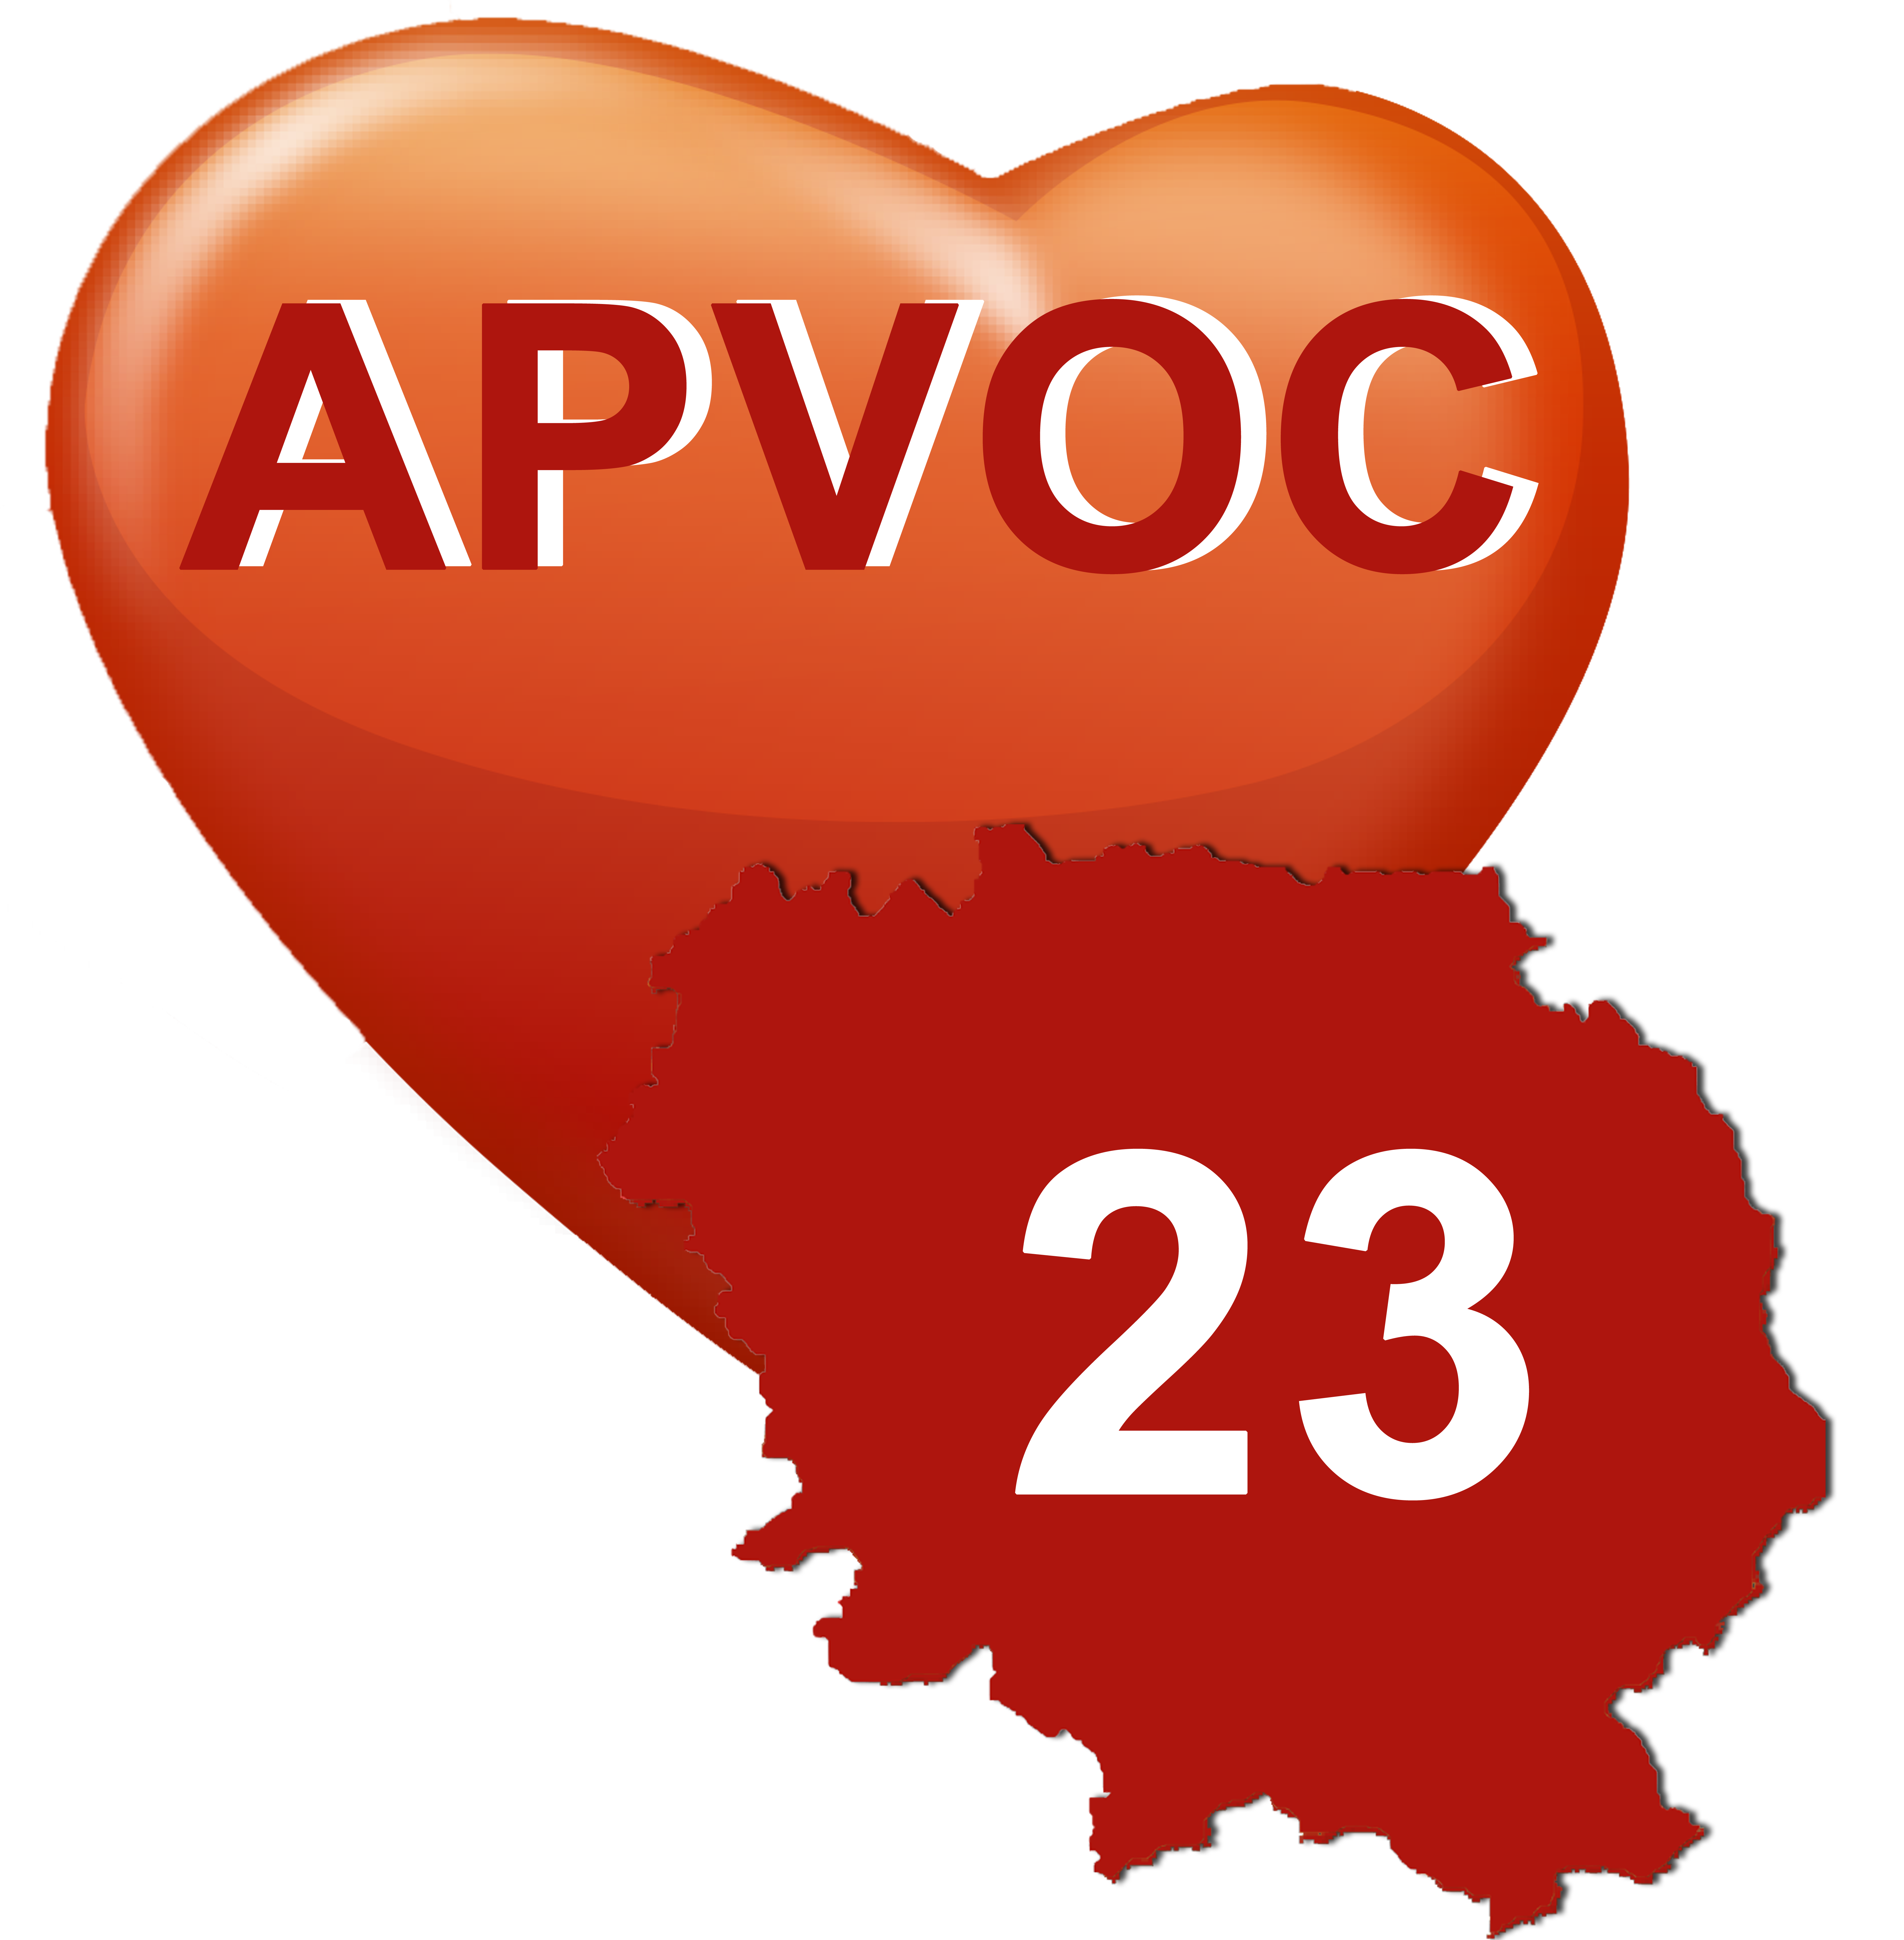 LOGO APVOC 23